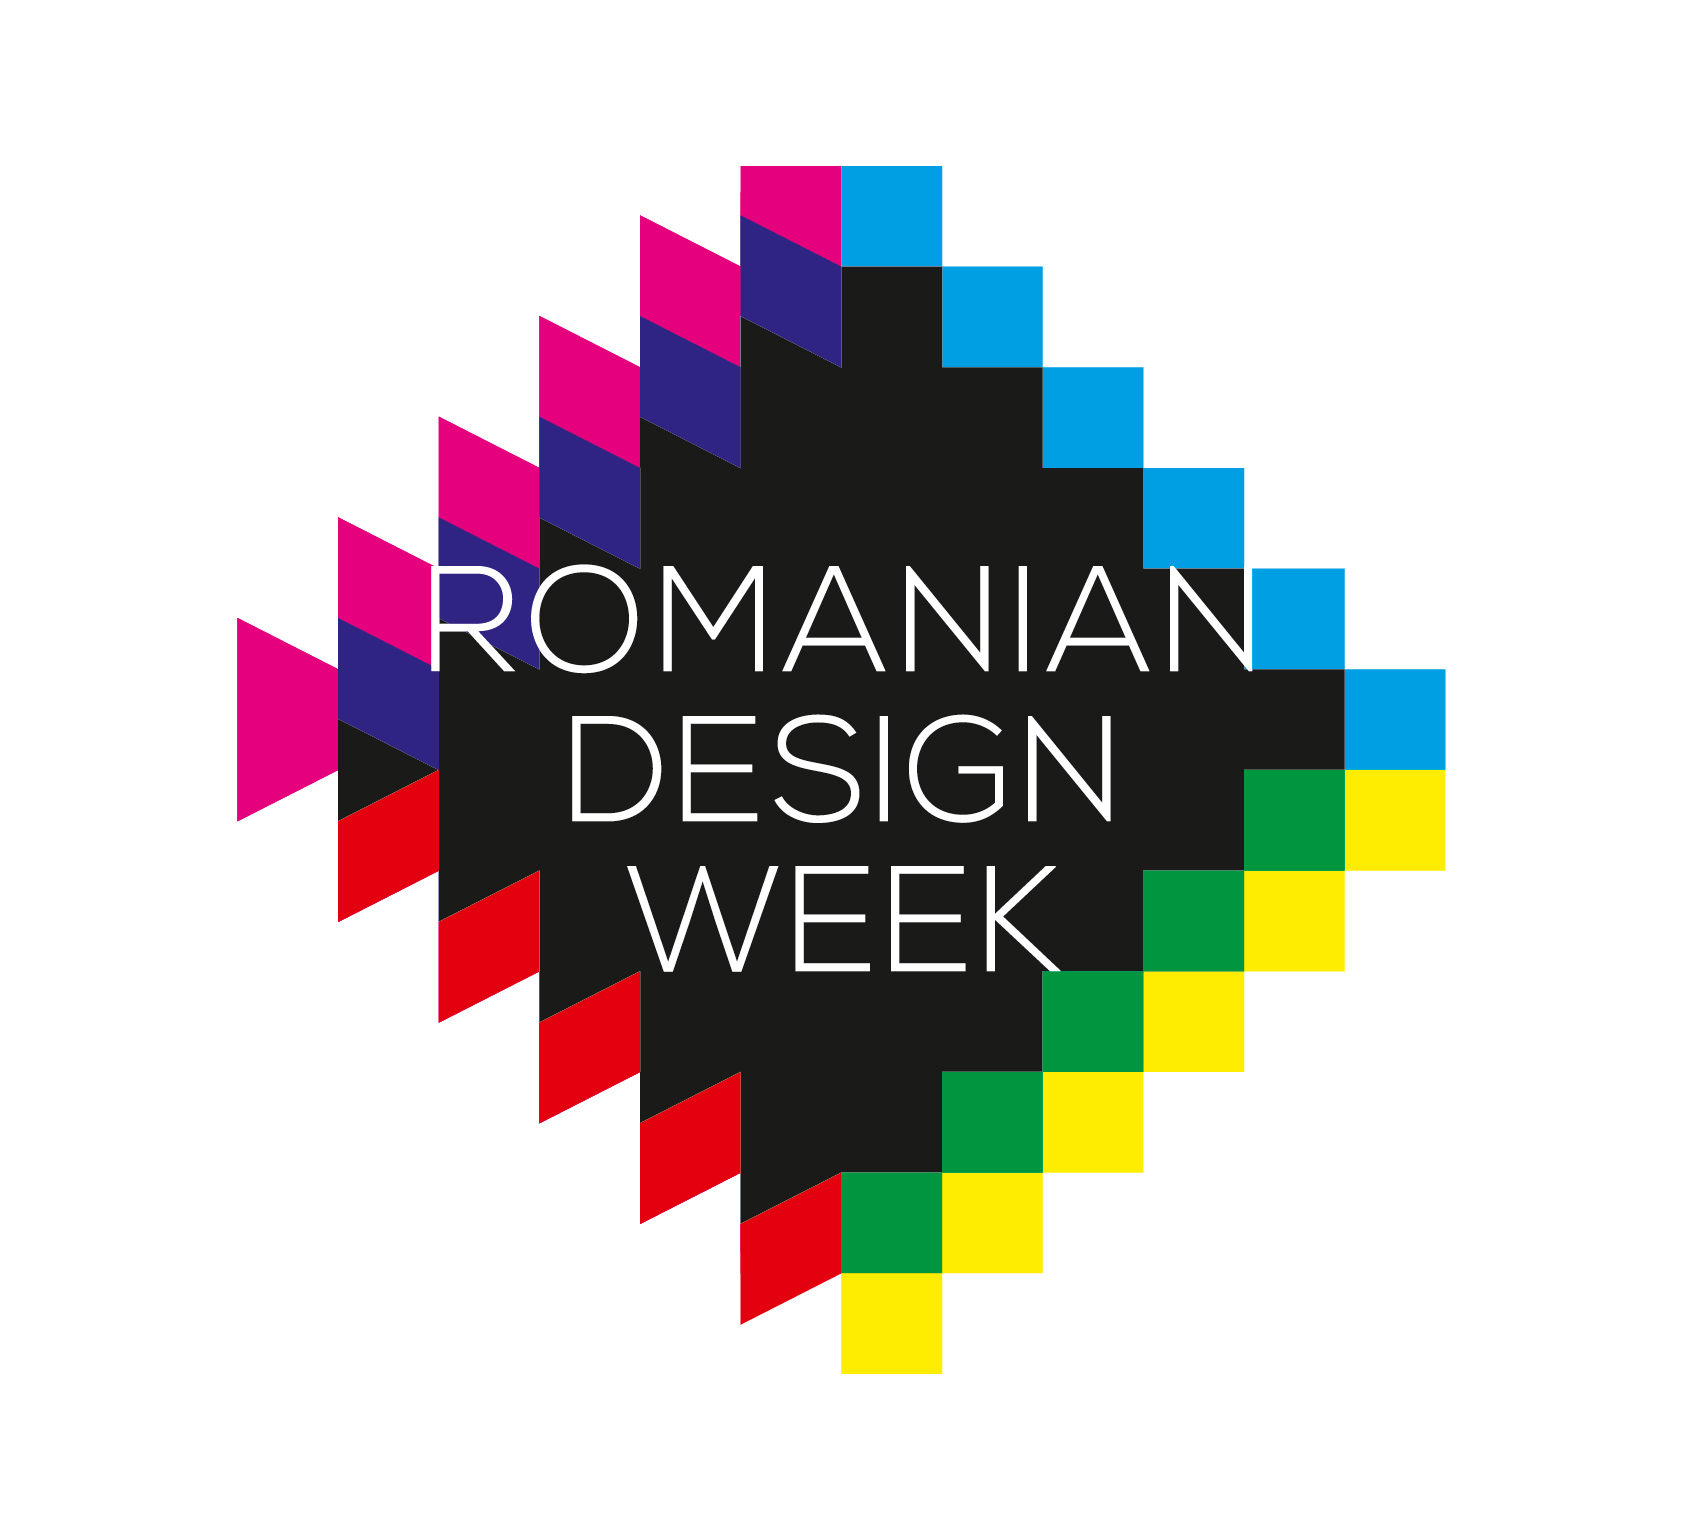 Romanian Design Week 2015: arhitectură, design interior, urbanism, fashion, graphic design, ilustrație, branding, lifestyle și design de produs